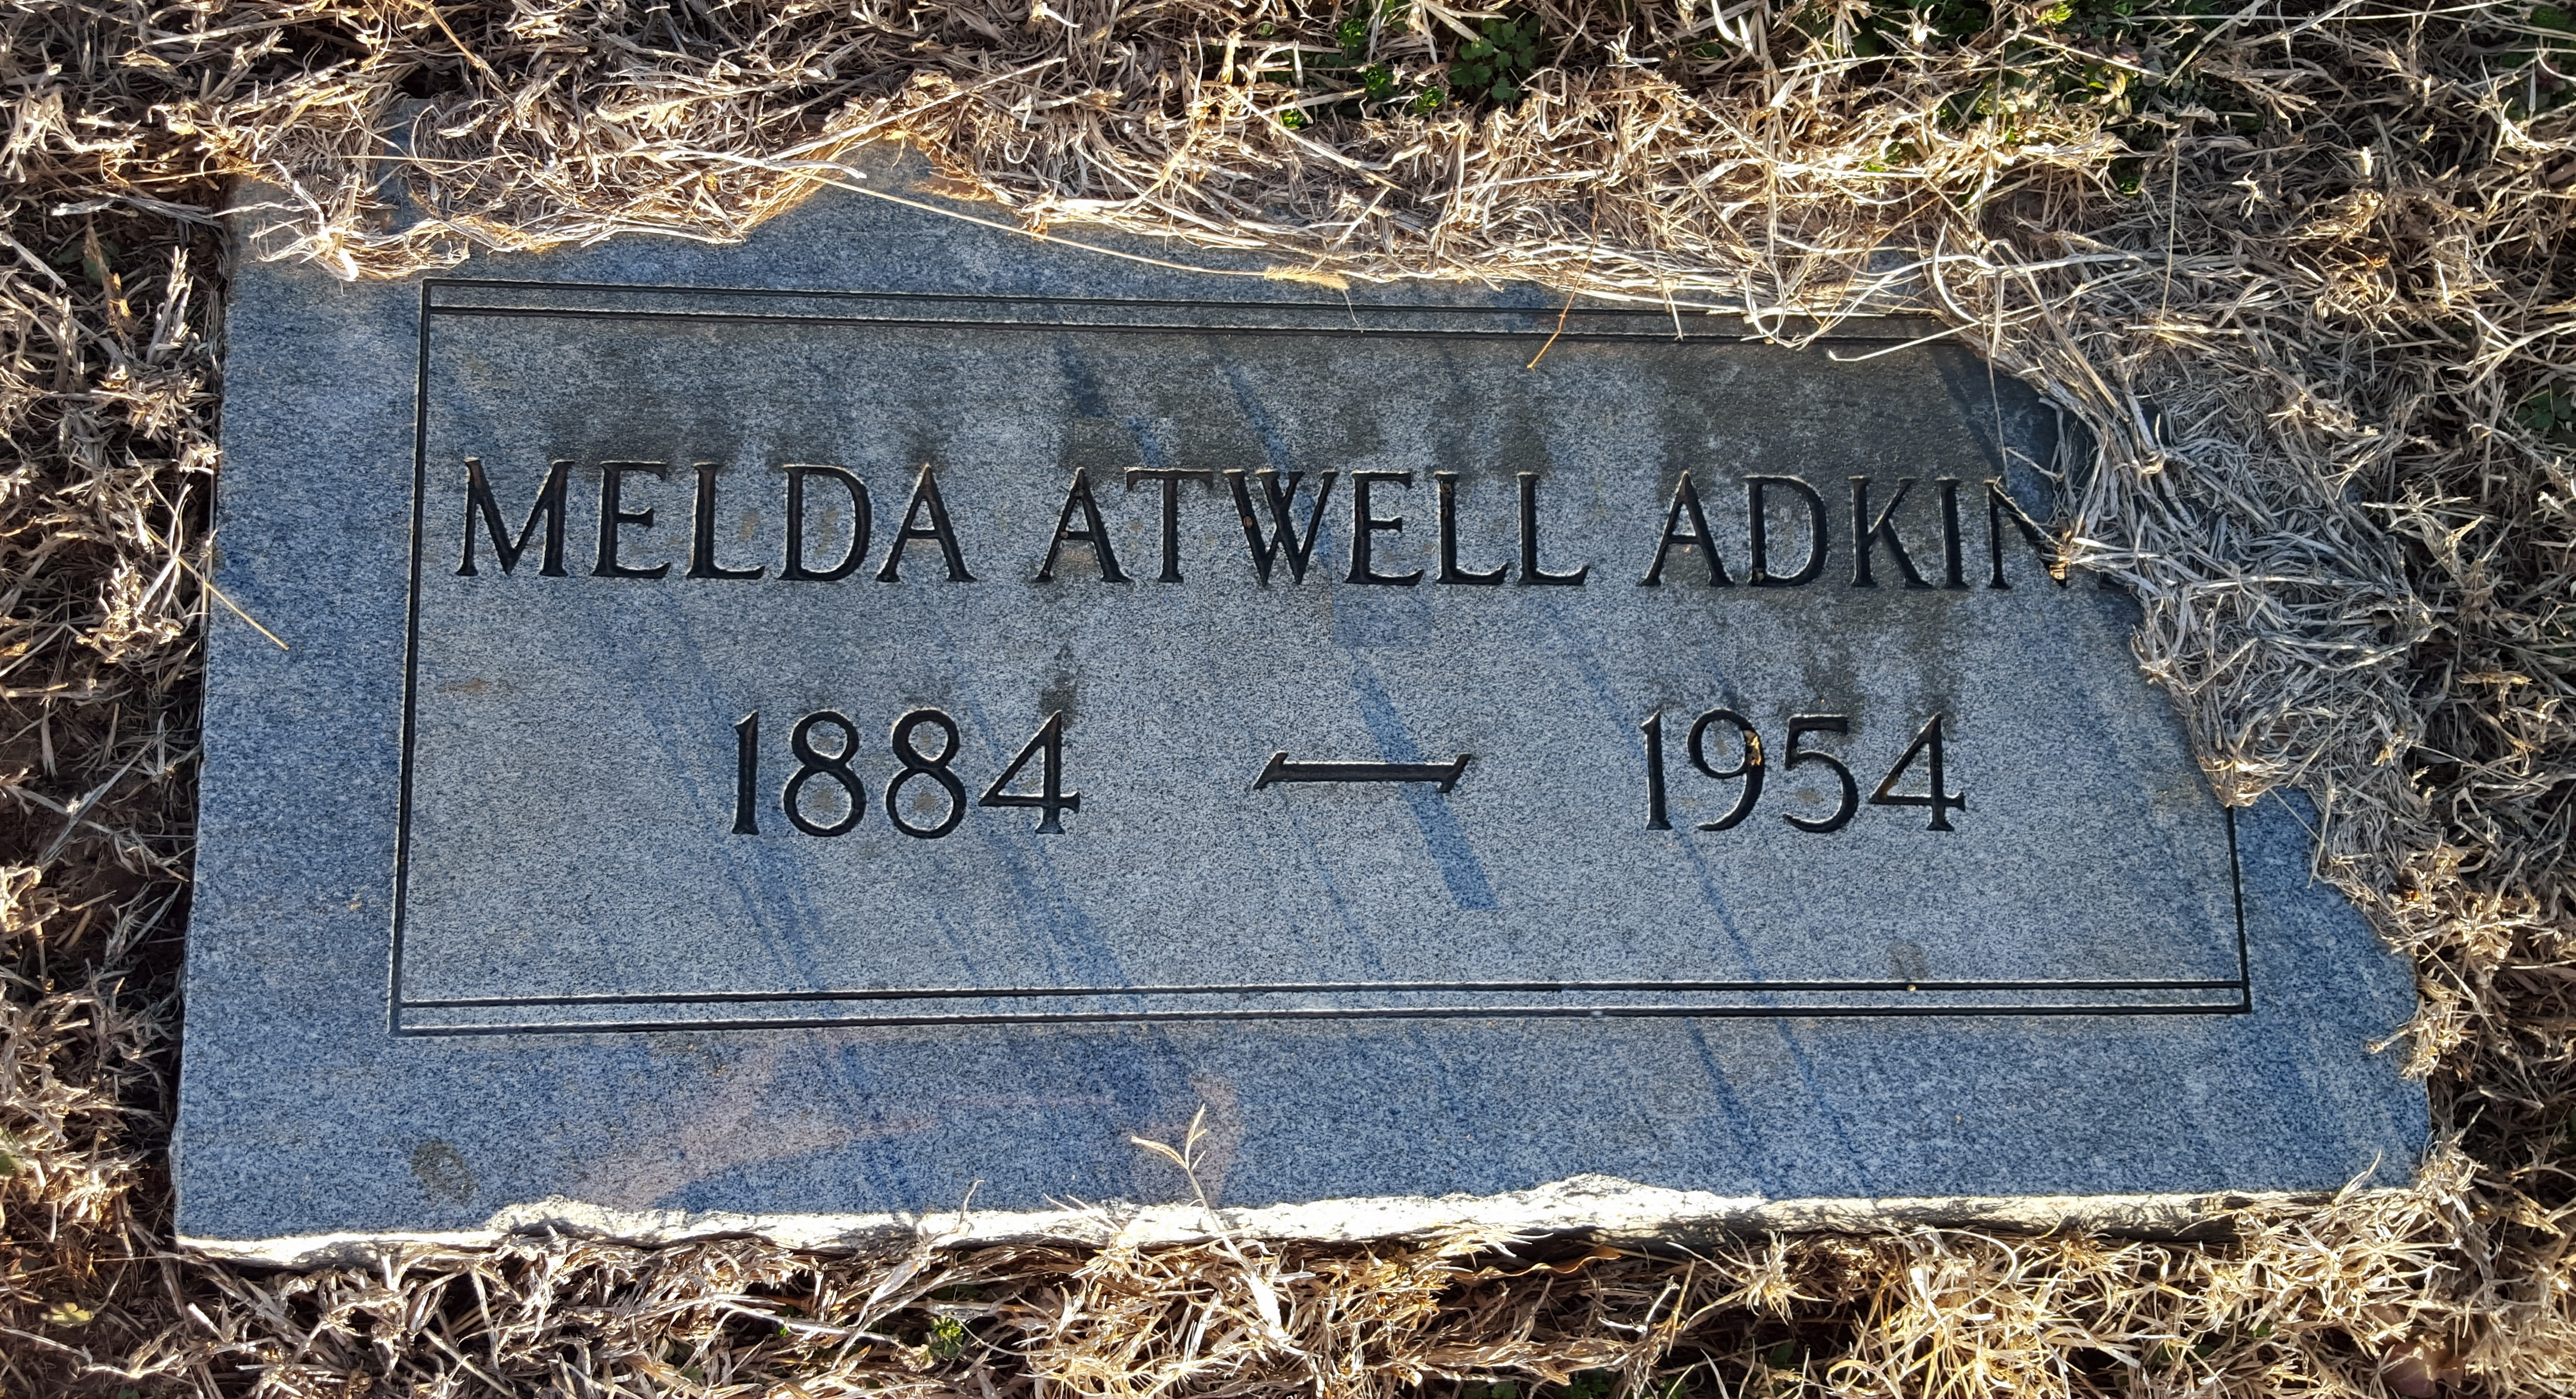 Melda Atwell Adkins